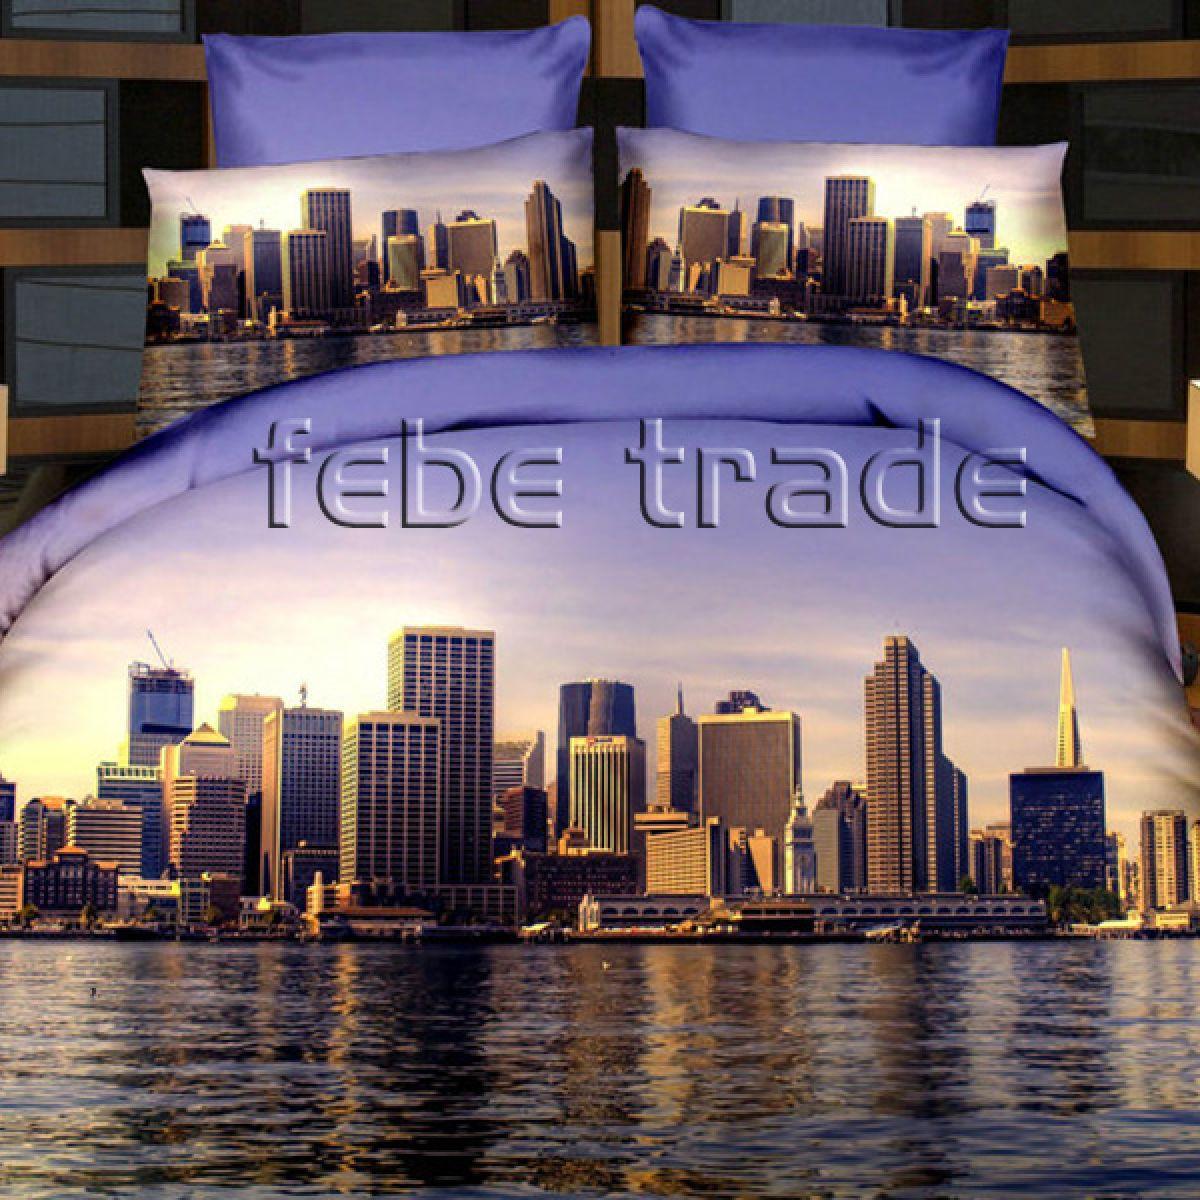 3D Beddings - Cotton World - FSH-165 - 220x200 cm - 3 cz